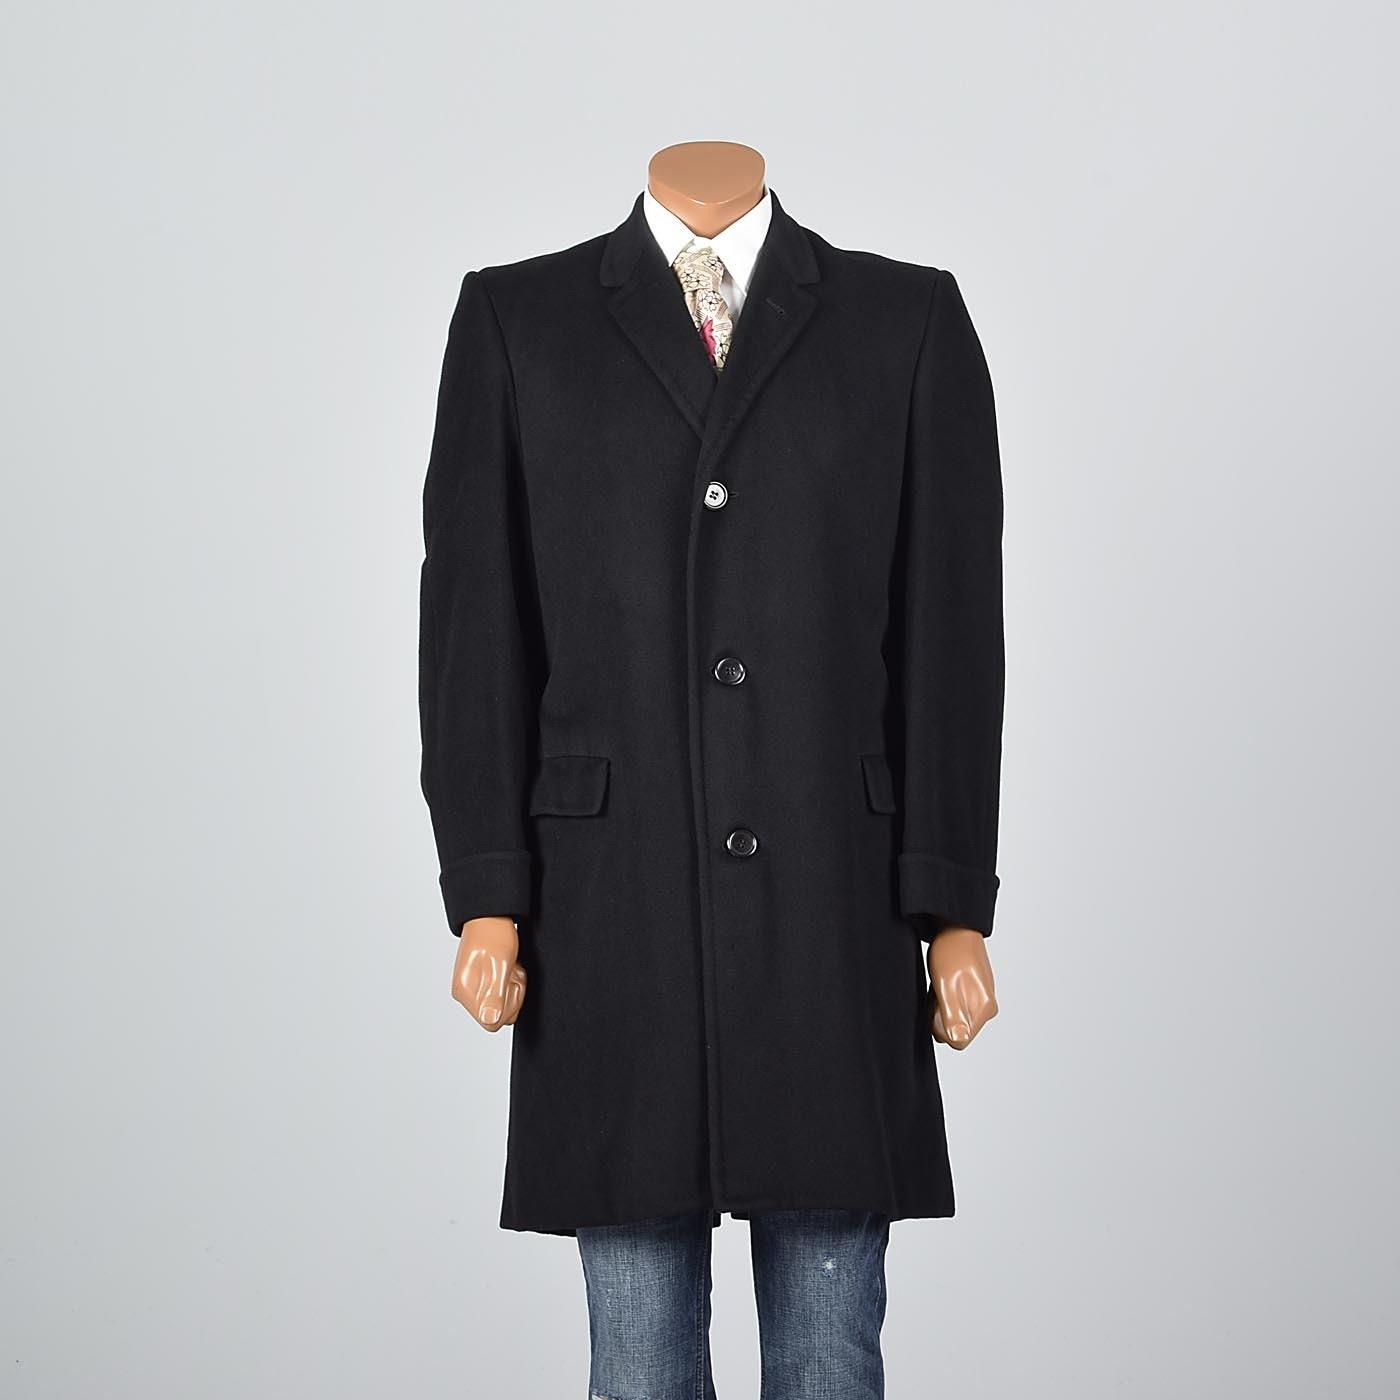 1950s Mens Hats | 50s Vintage Men's Hats Medium Mens Cashmere Top Coat Black Overcoat 1950S 50S Slim Lapel Mid Century Winter Fall Spring Vintage Formal $0.00 AT vintagedancer.com